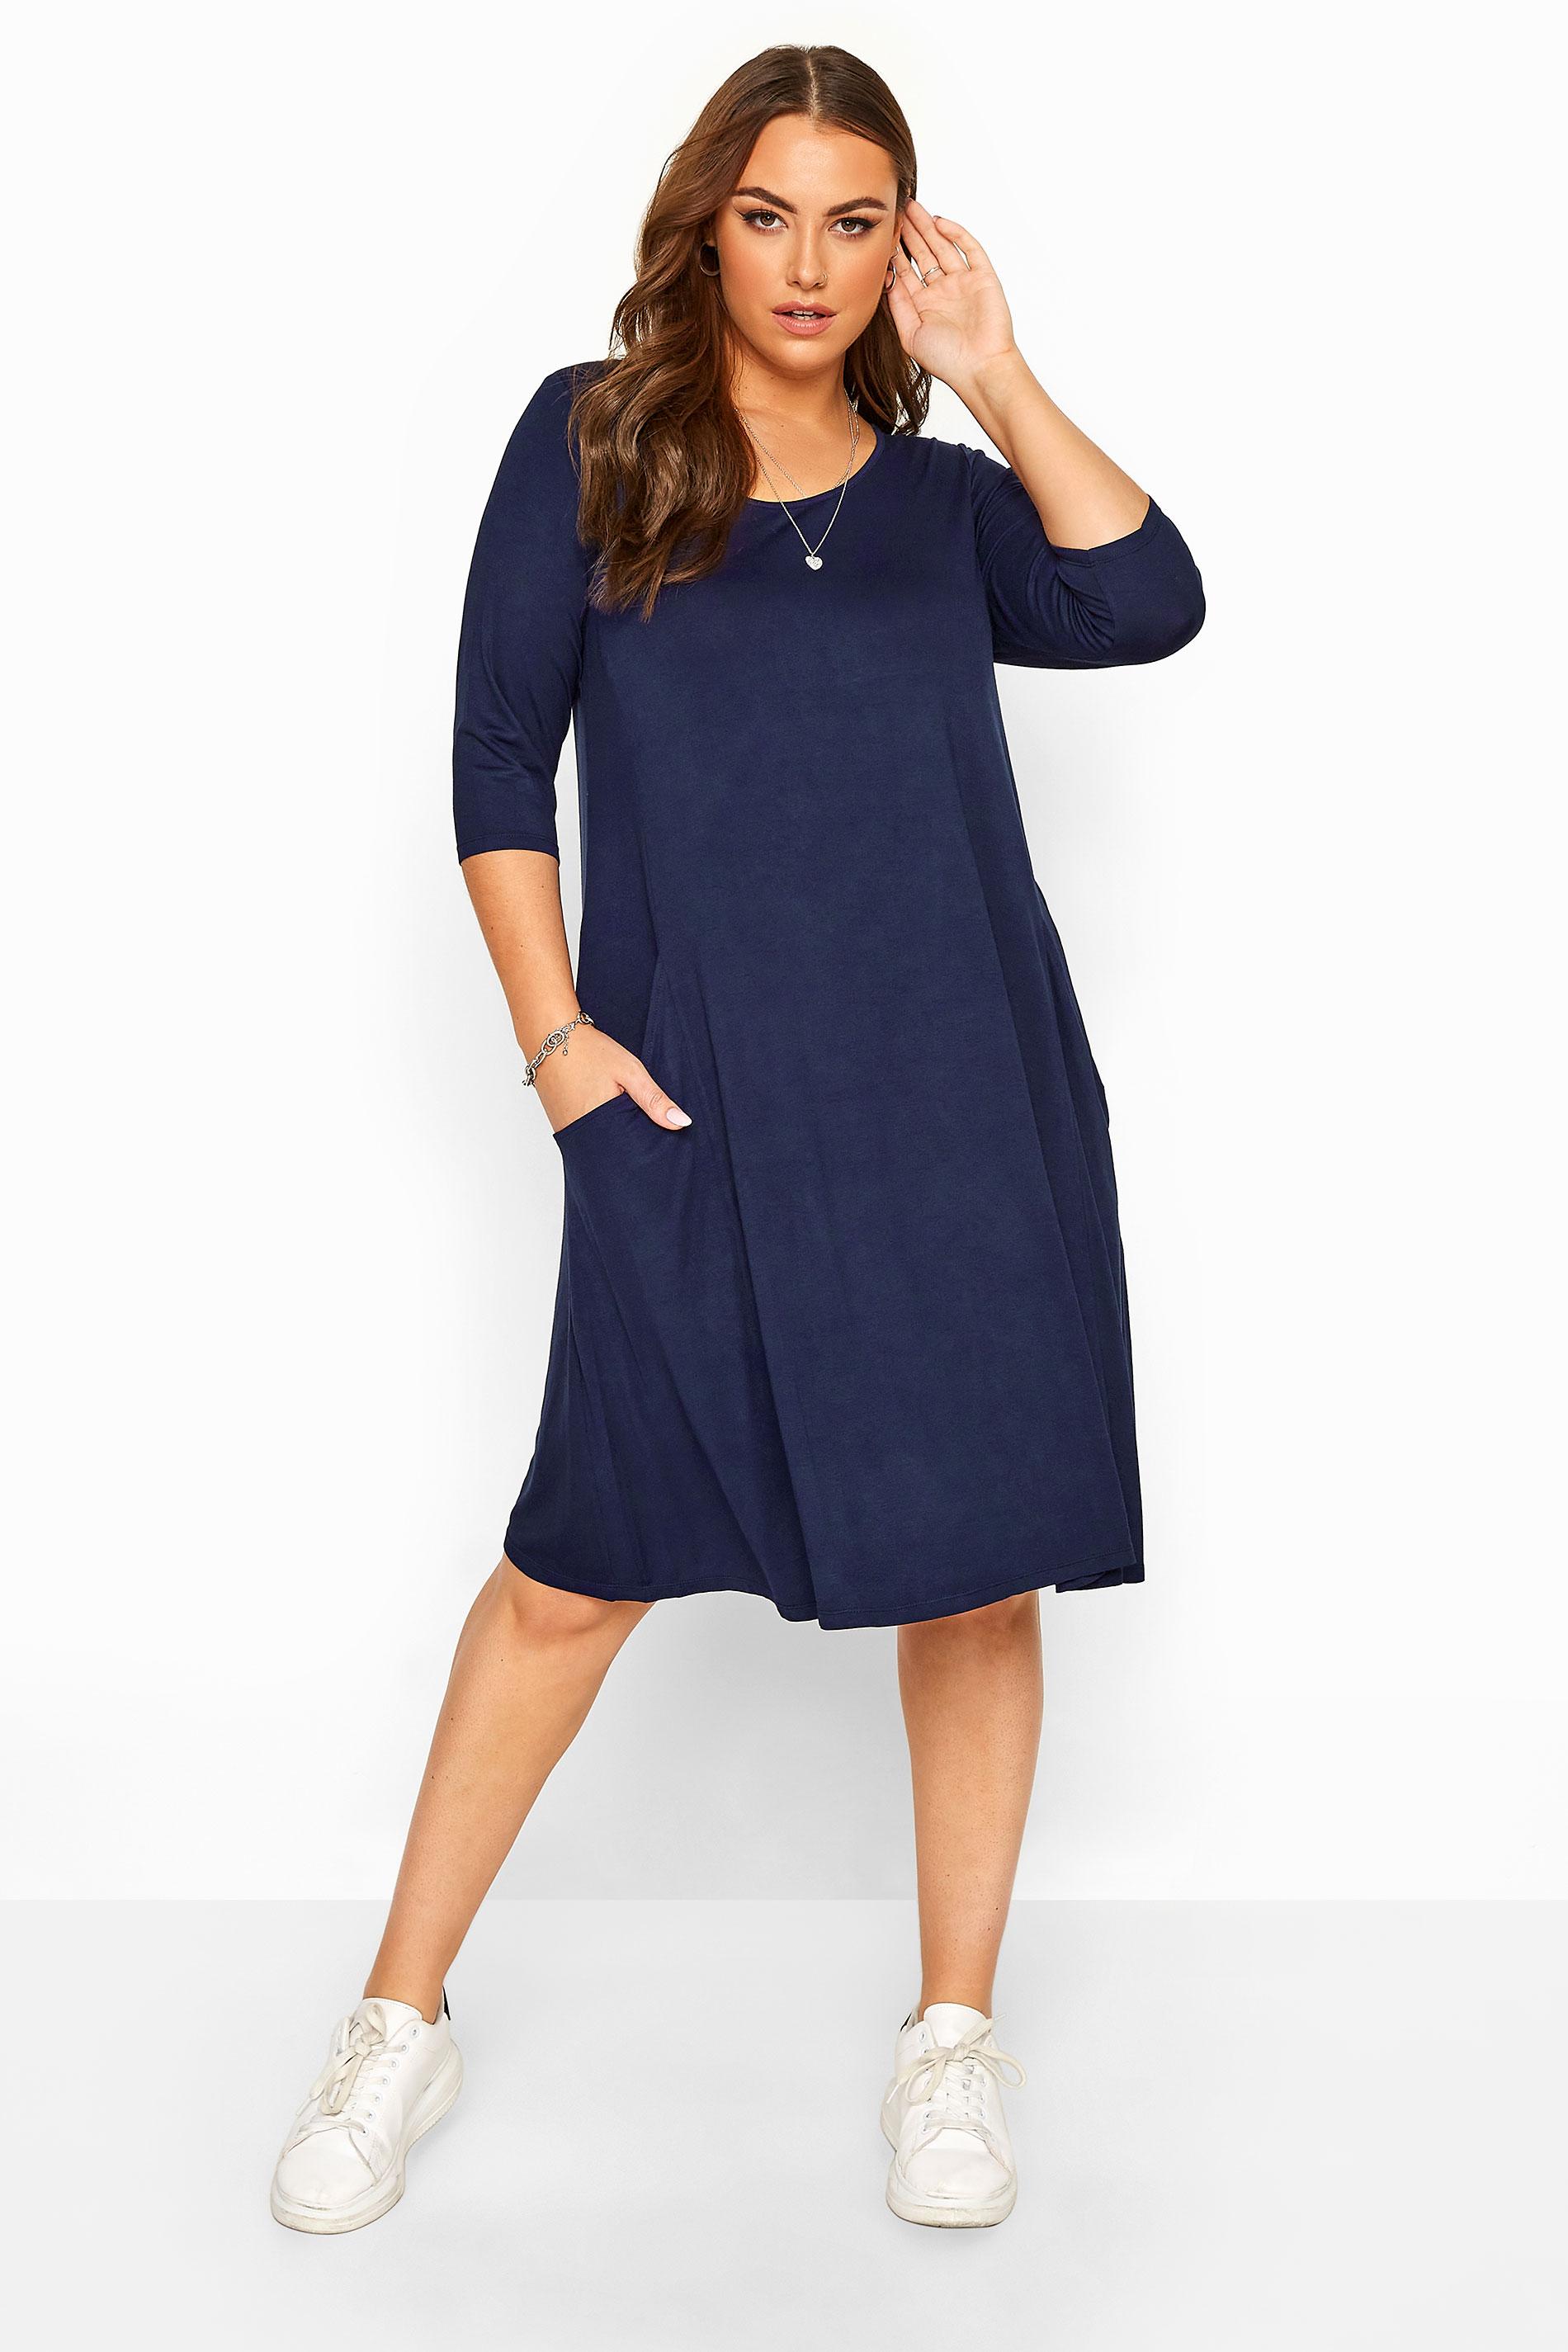 Navy Drape Pocket Dress